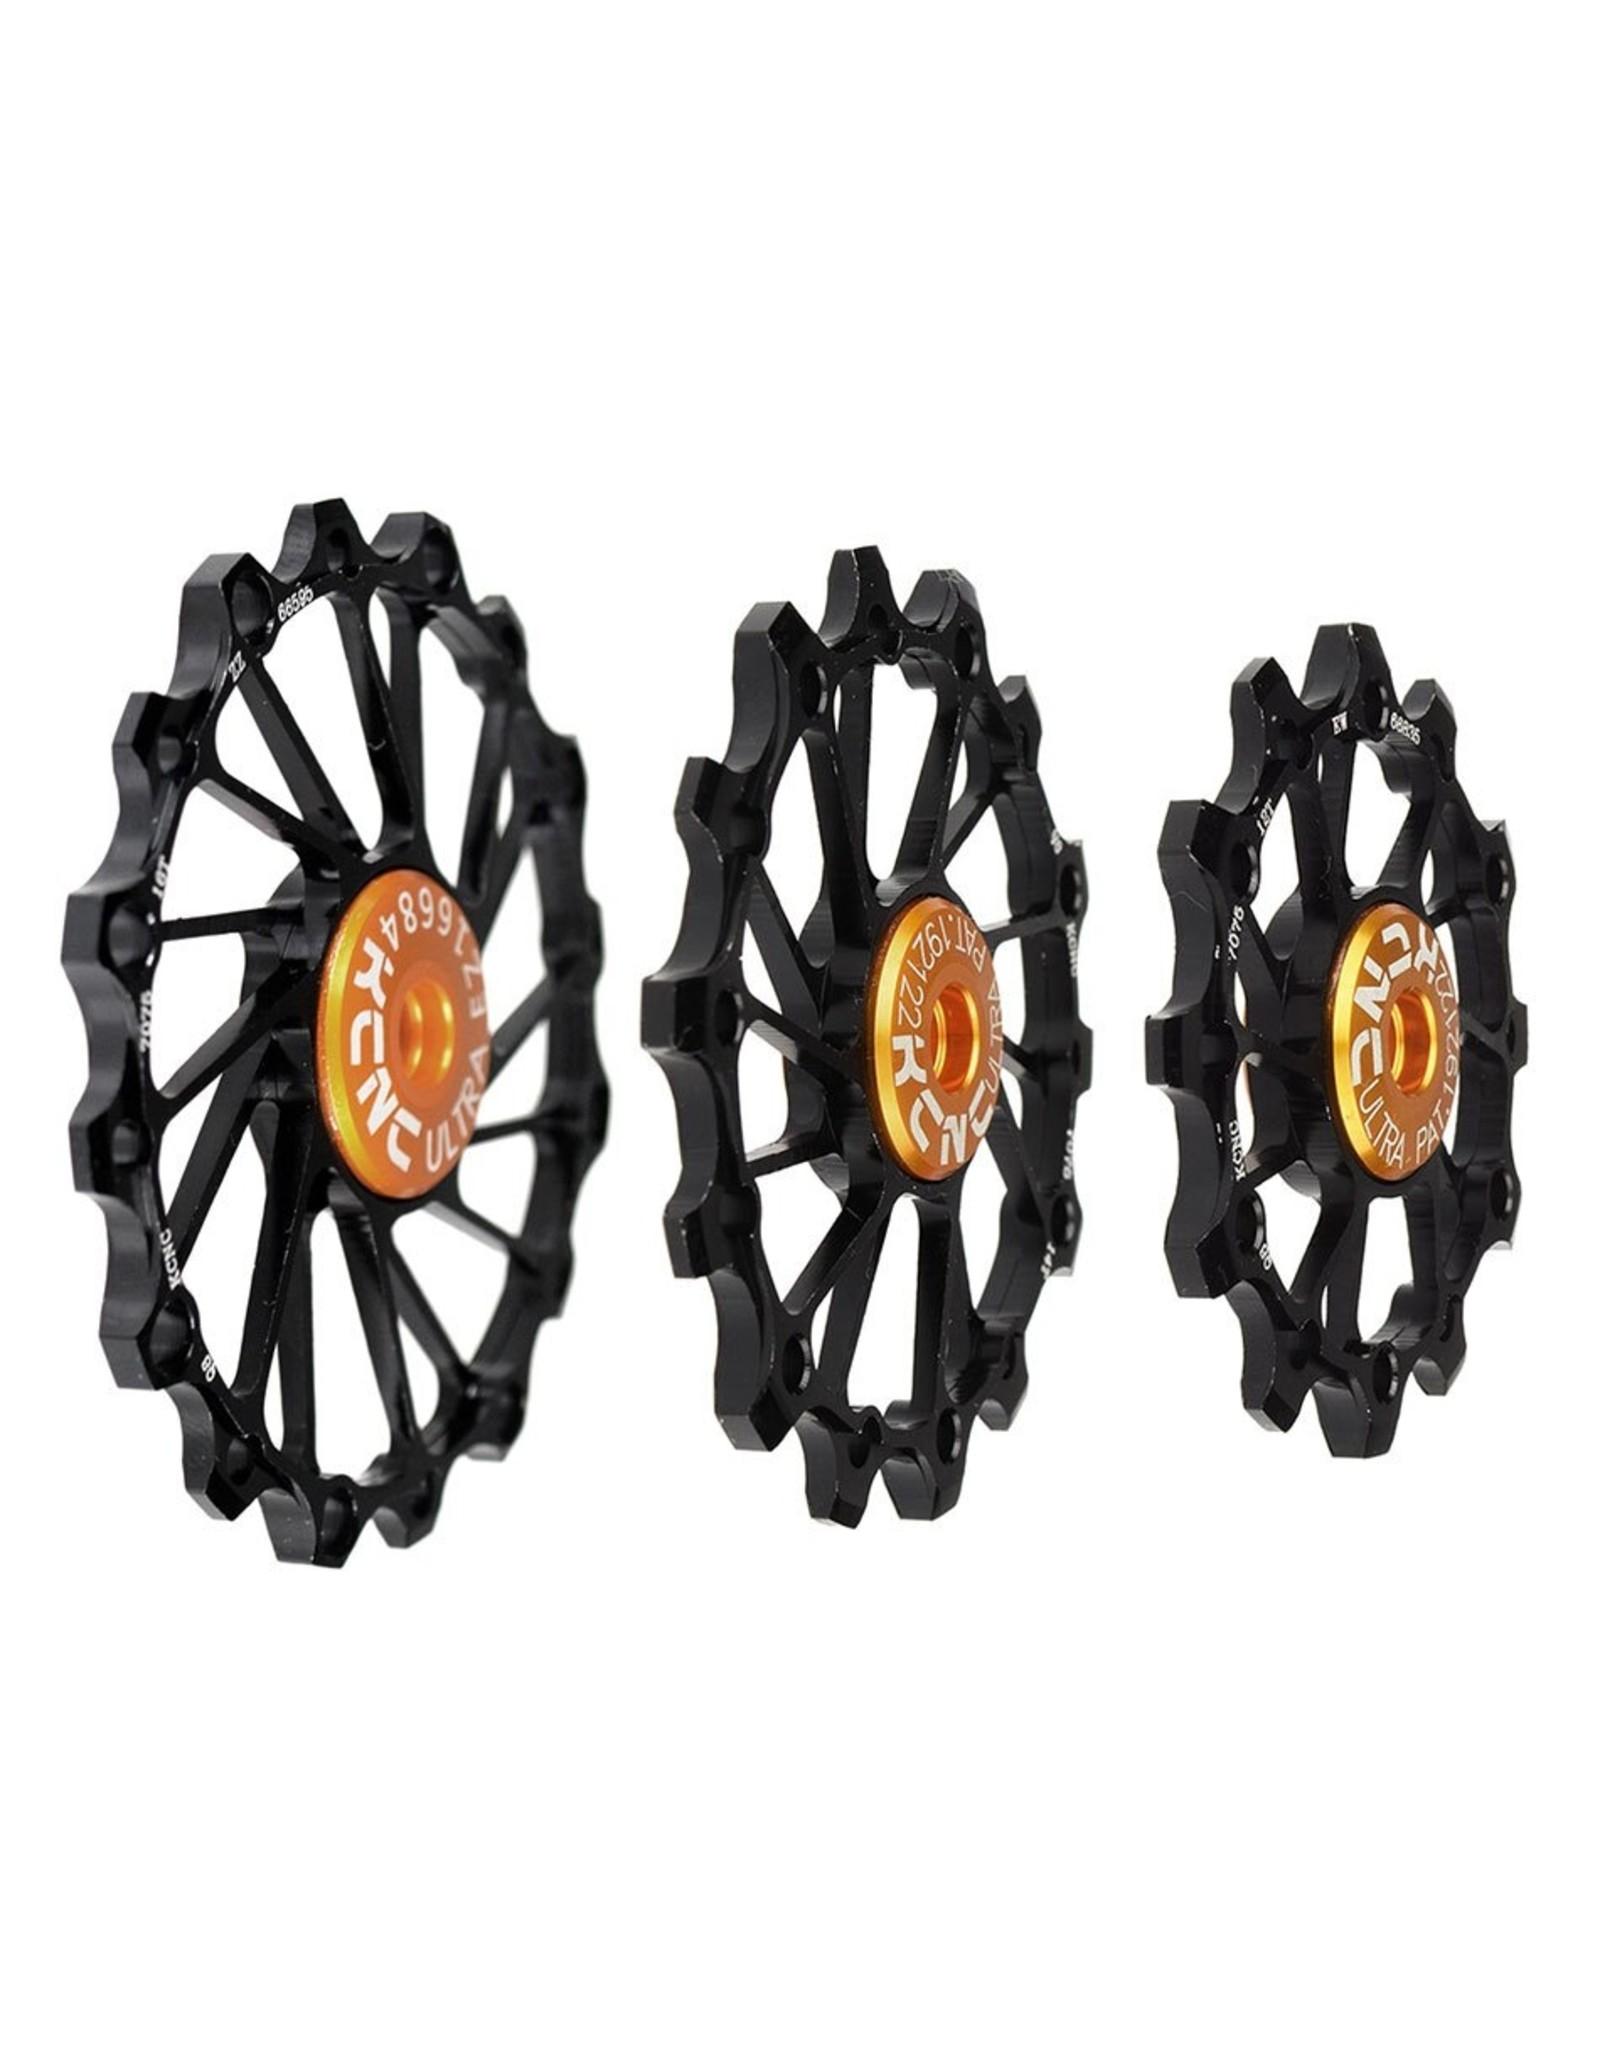 KCNC KCNC Narrow/Wide Ultra Pulley Wheel